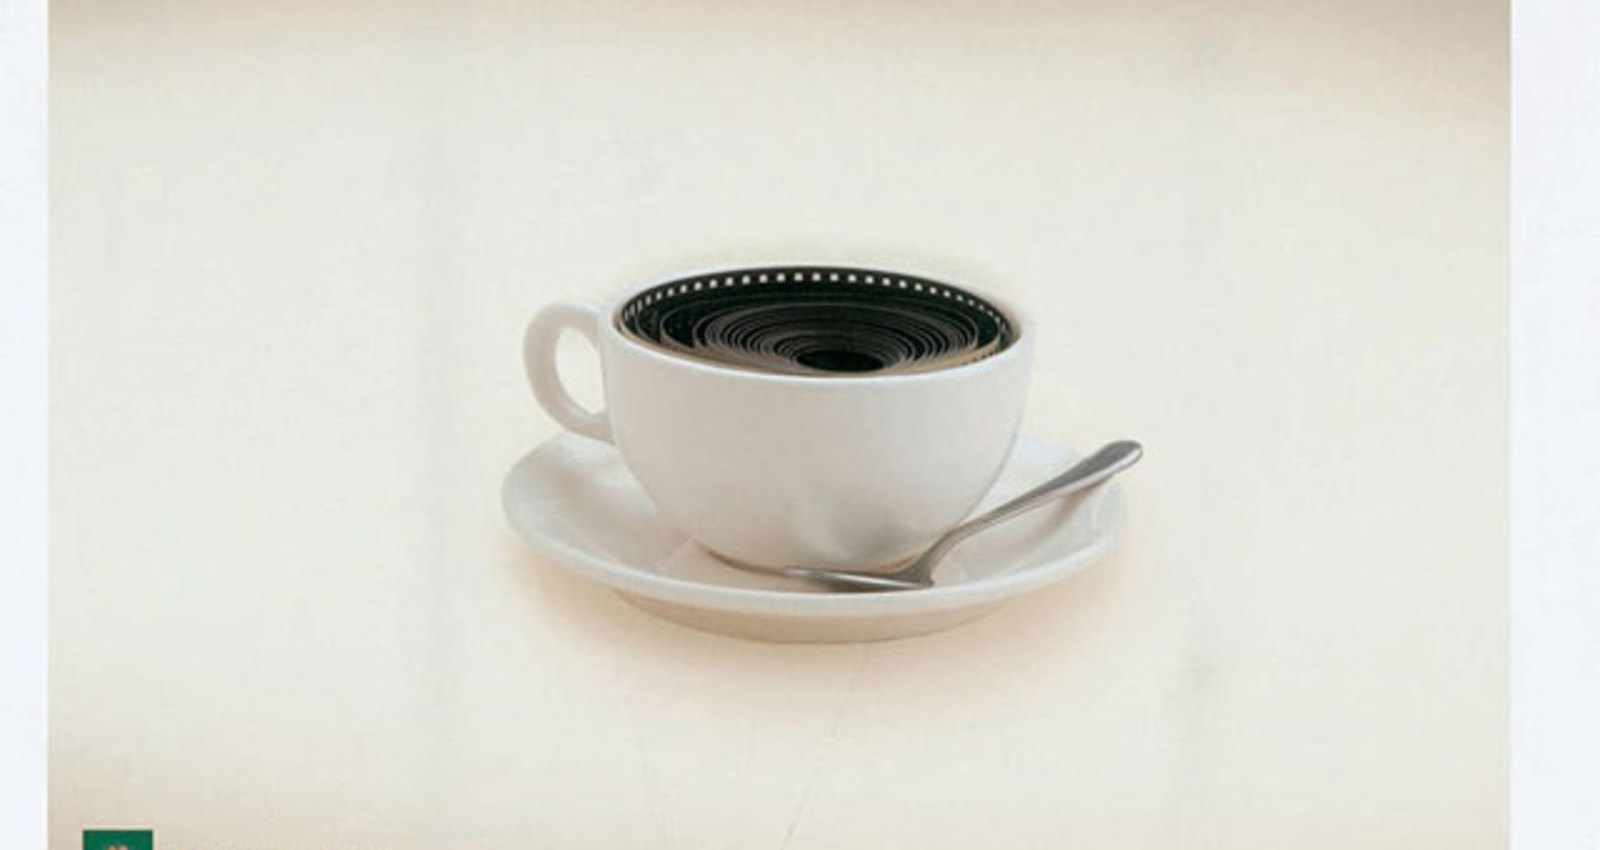 Sushi/Snails/Coffee/Swiss Roll